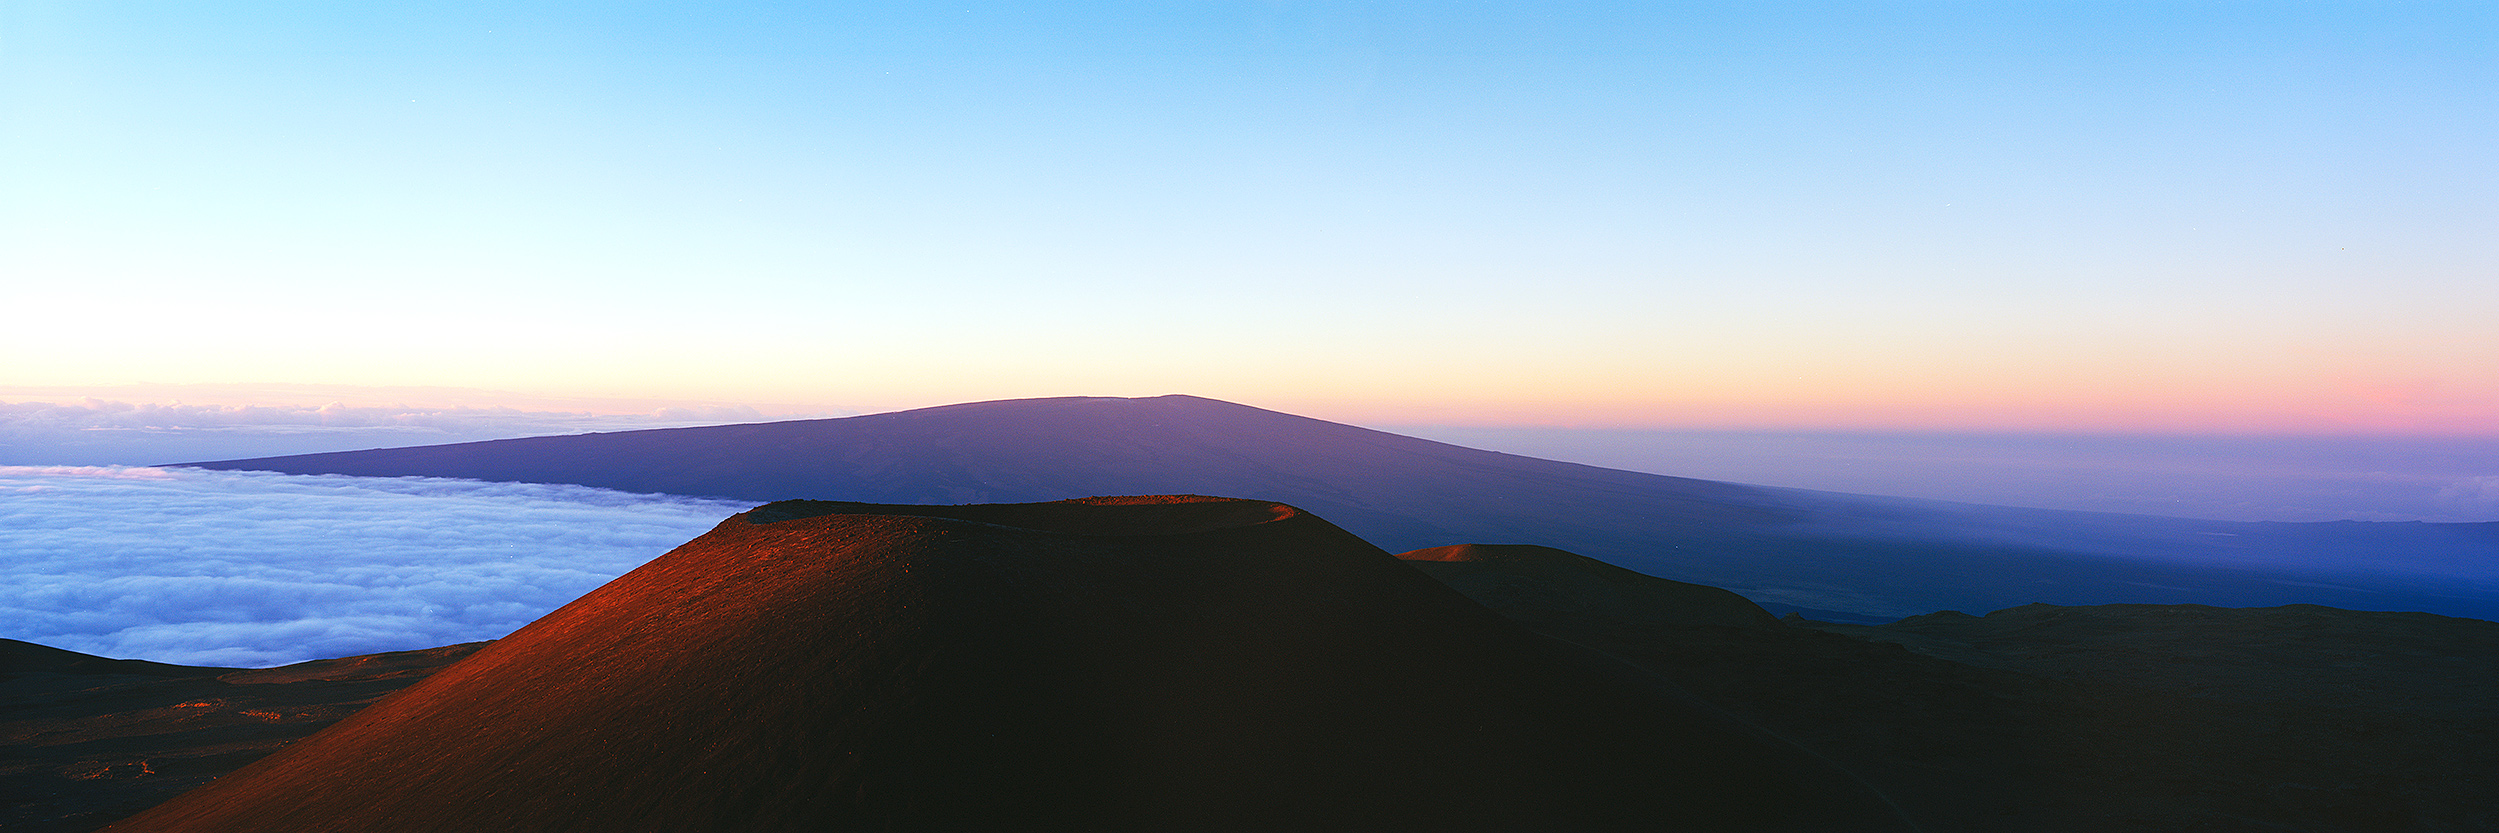 Mauna Kea at sunrise, Big Island 2014